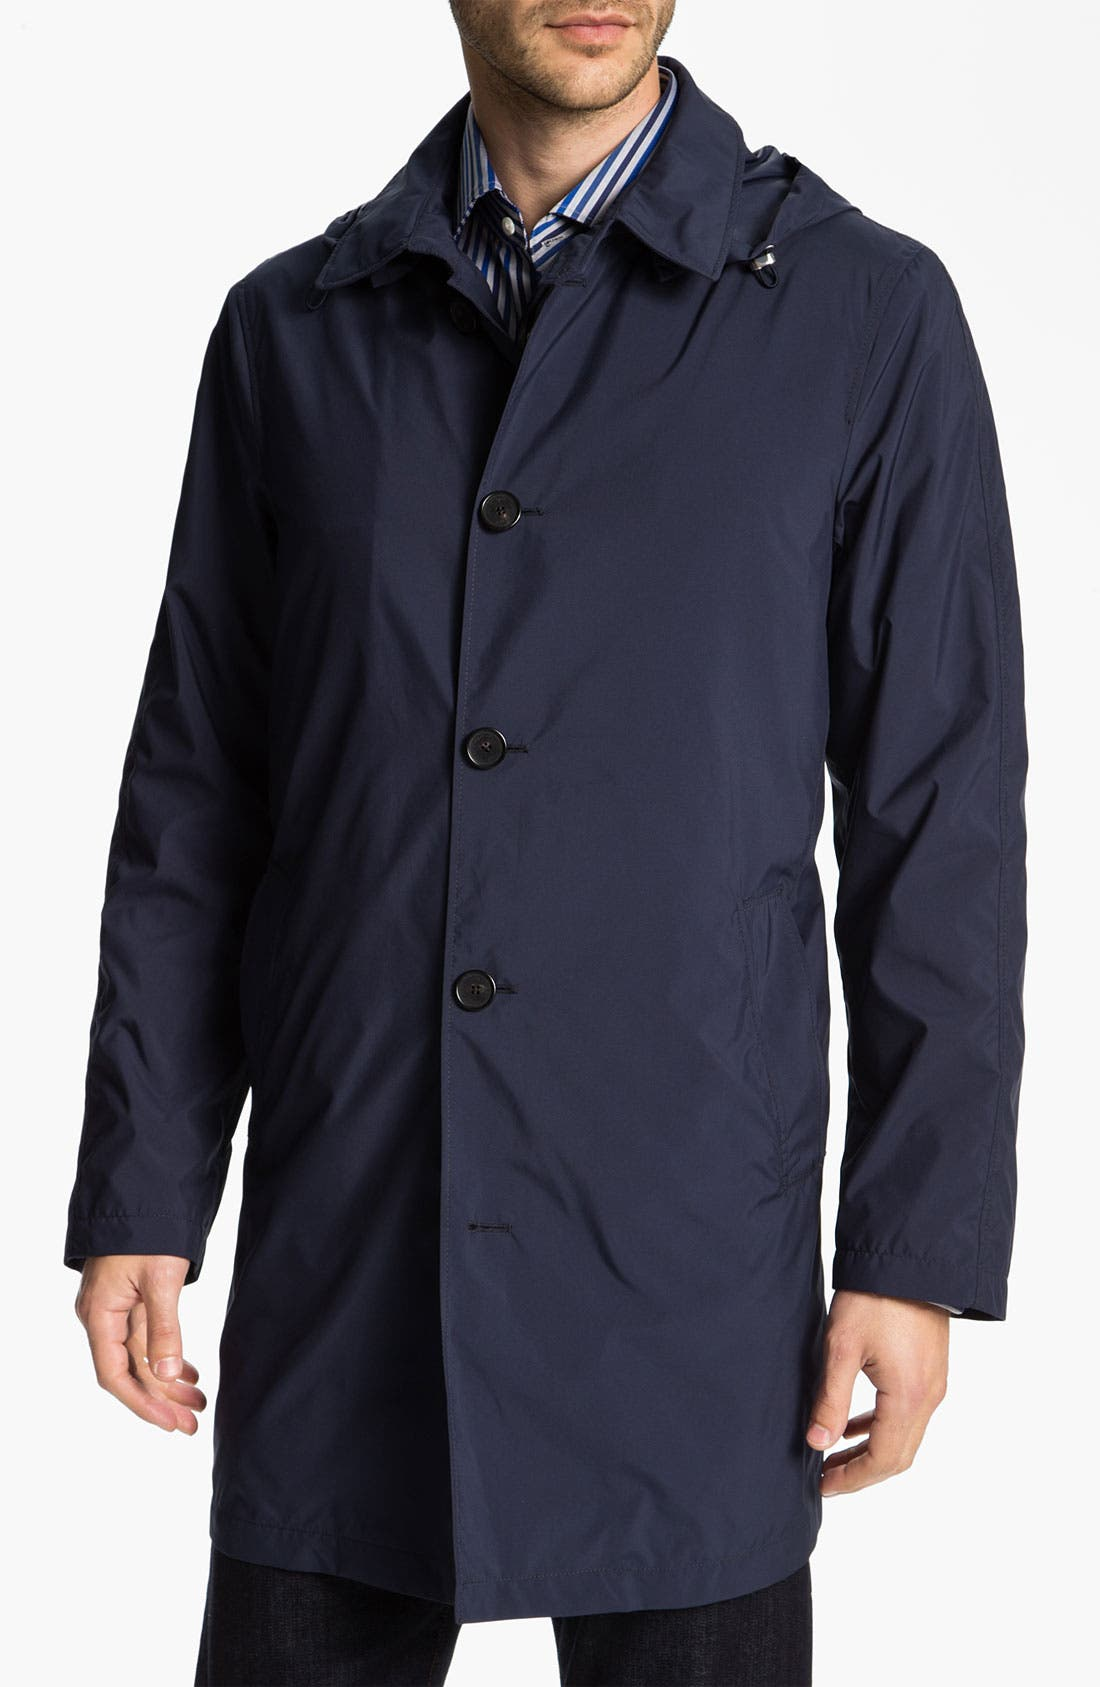 Main Image - Allegri 'City' Hooded Raincoat